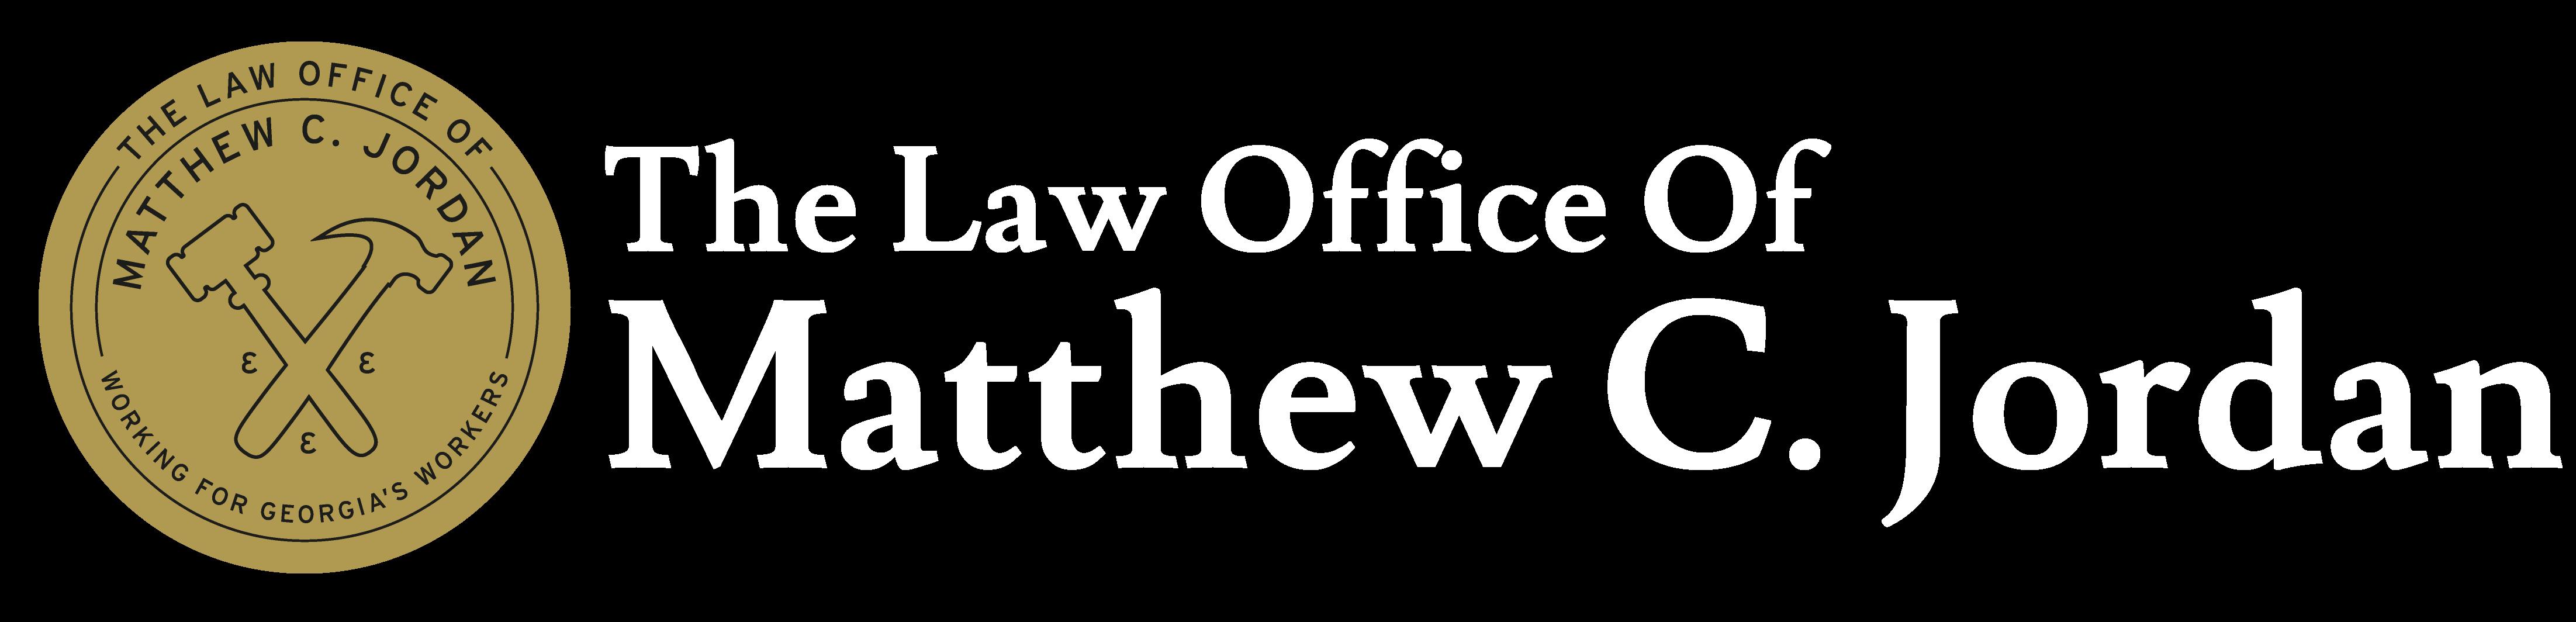 THE LAW OFFICE OF MATTHEW C. JORDAN